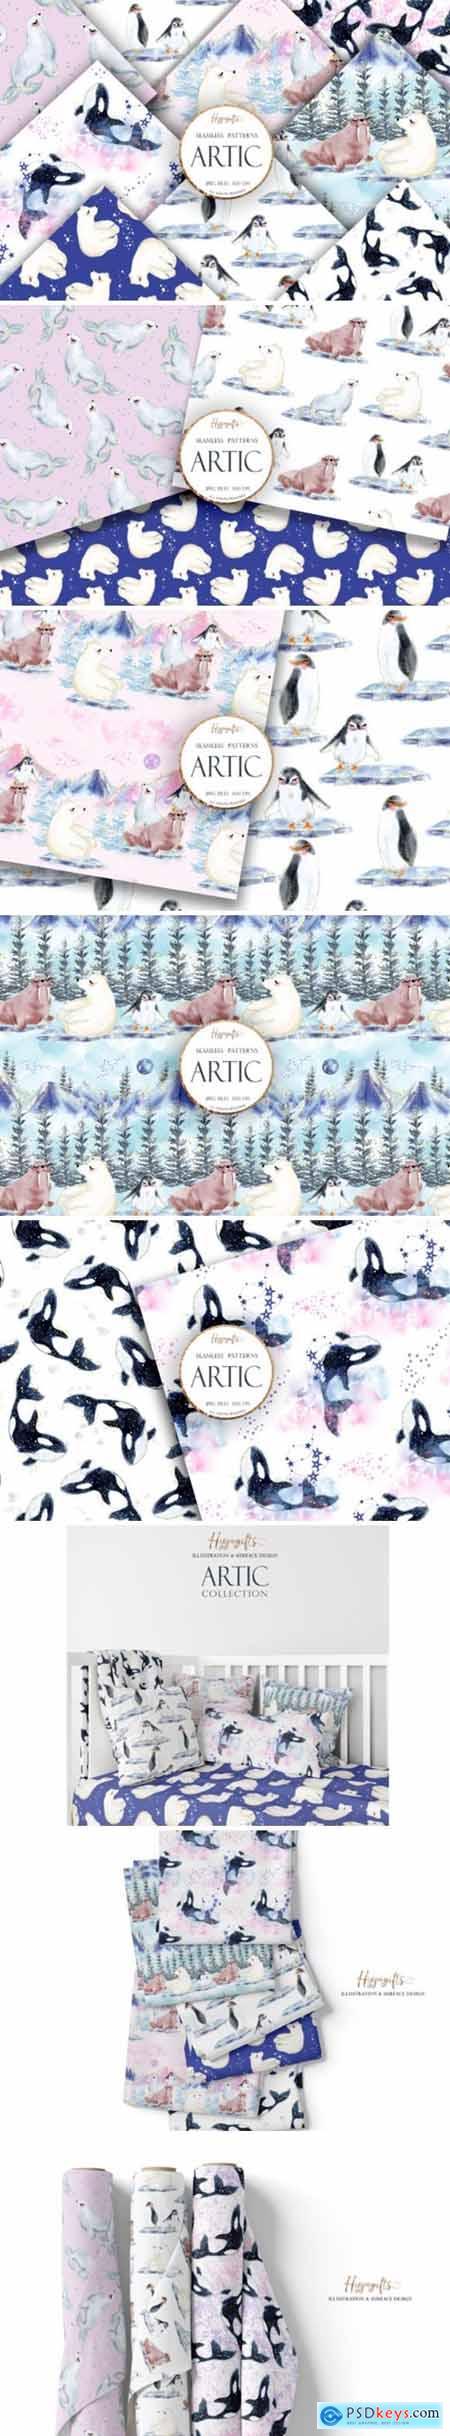 Artic Animals Patterns 4195977